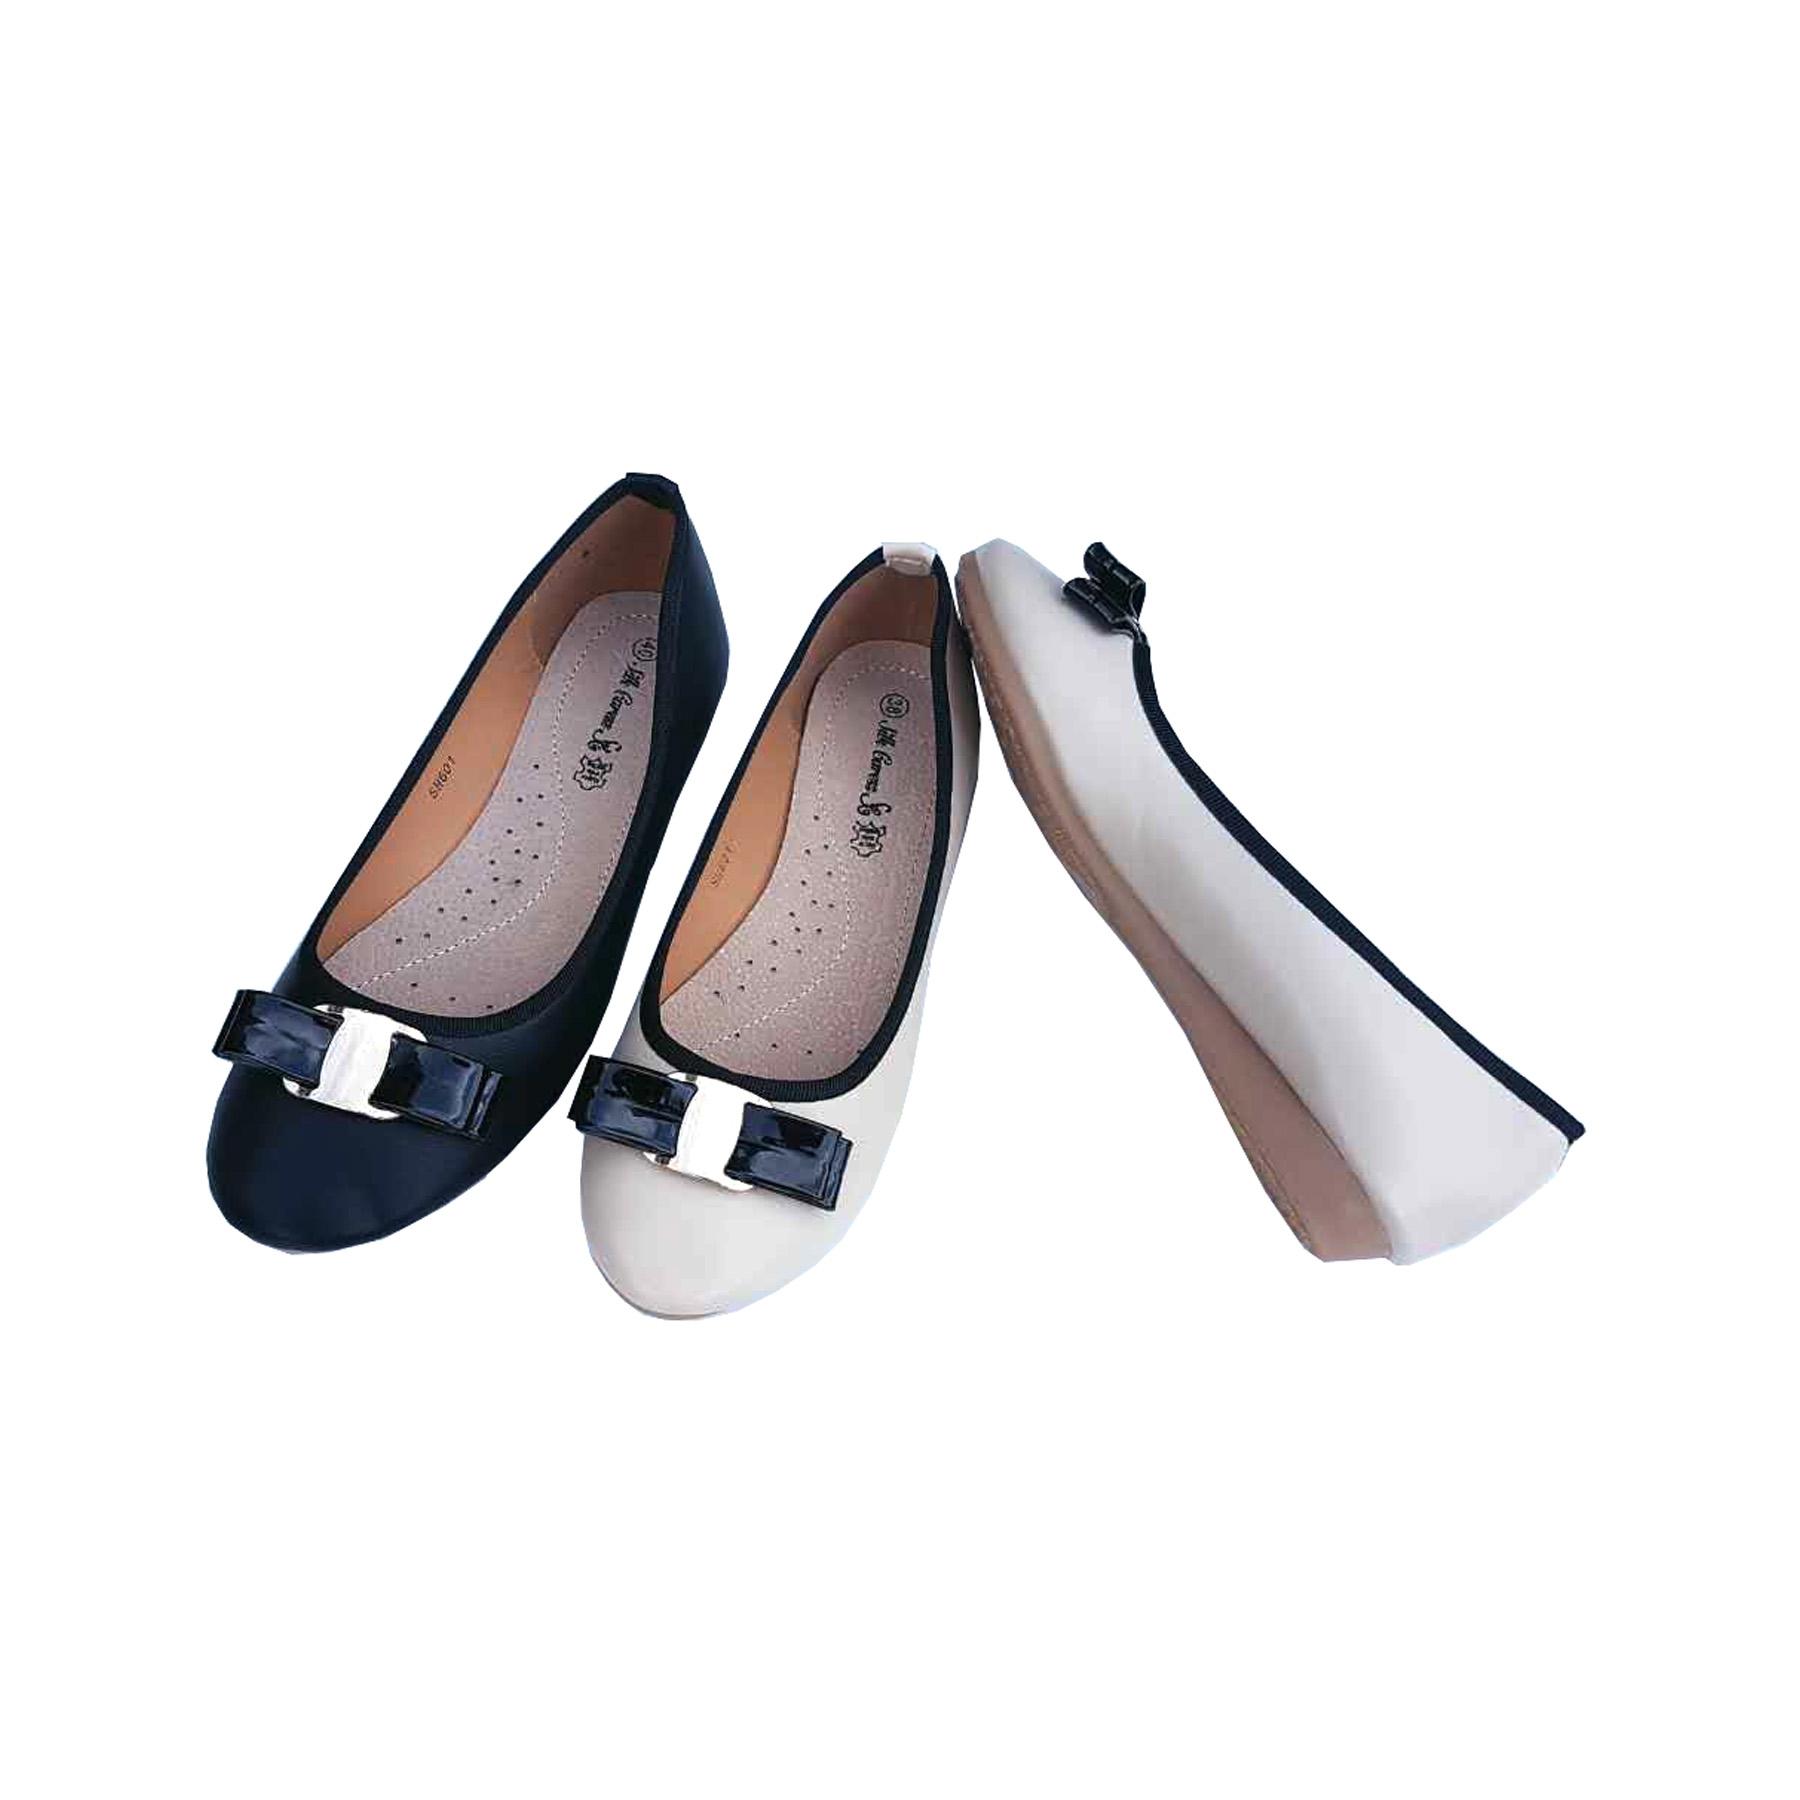 com gwen s kate flats comfortable york new comforter women dp shoes womens flat ballet amazon spade